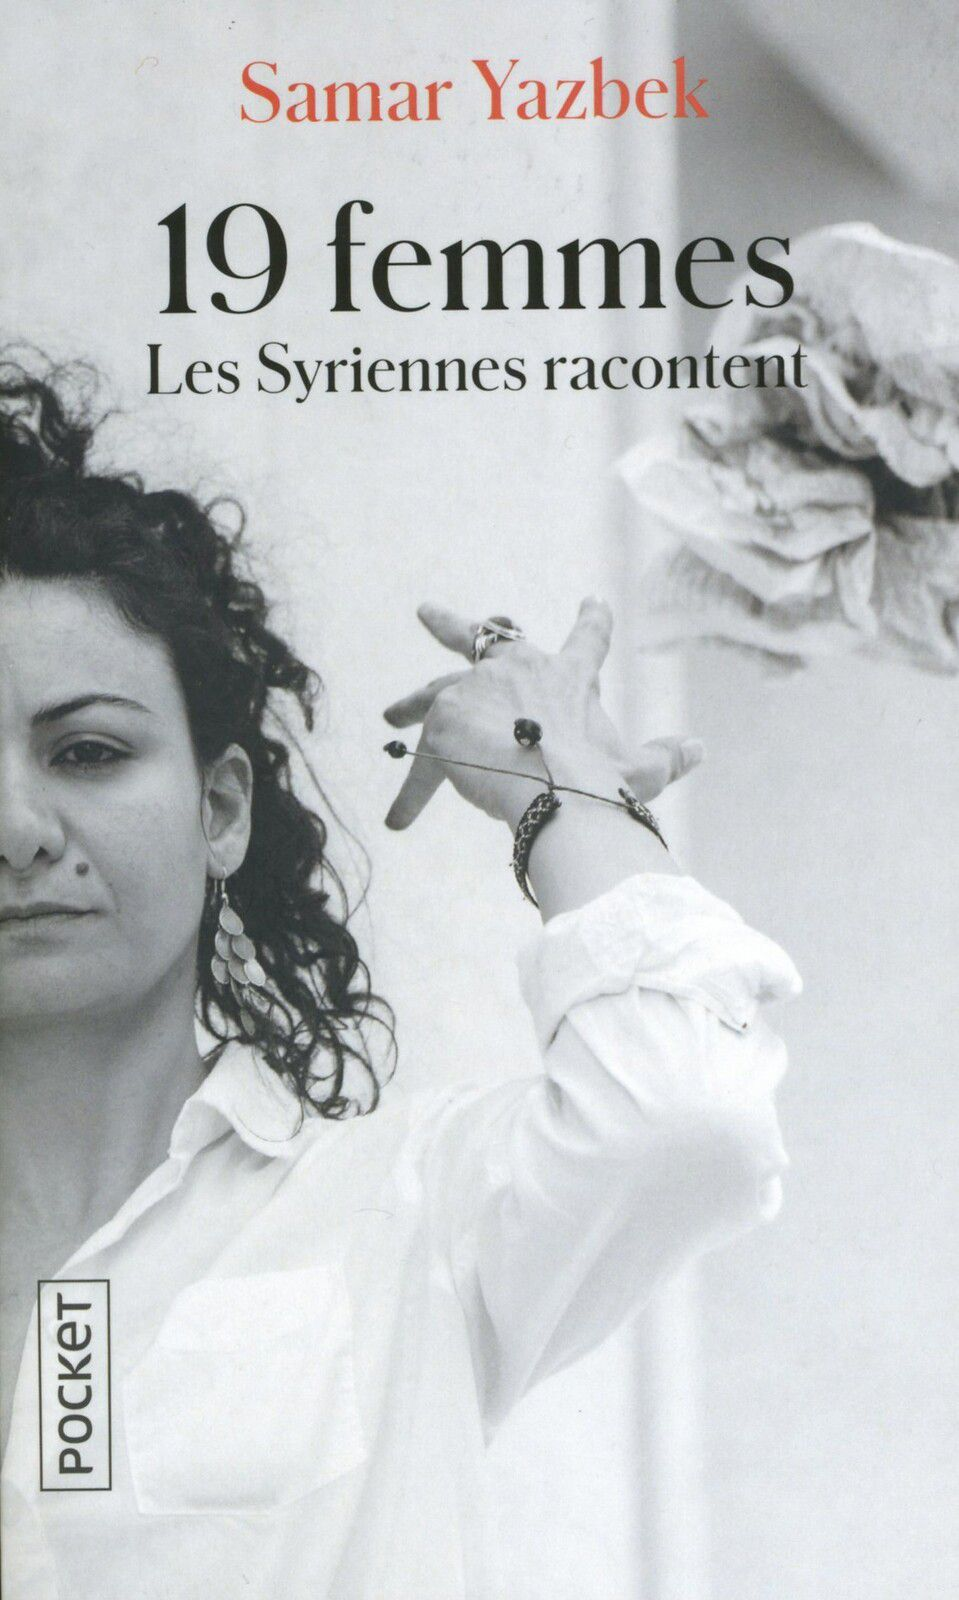 Samar YAZBEK 19 femmes-Les Syriennes racontent